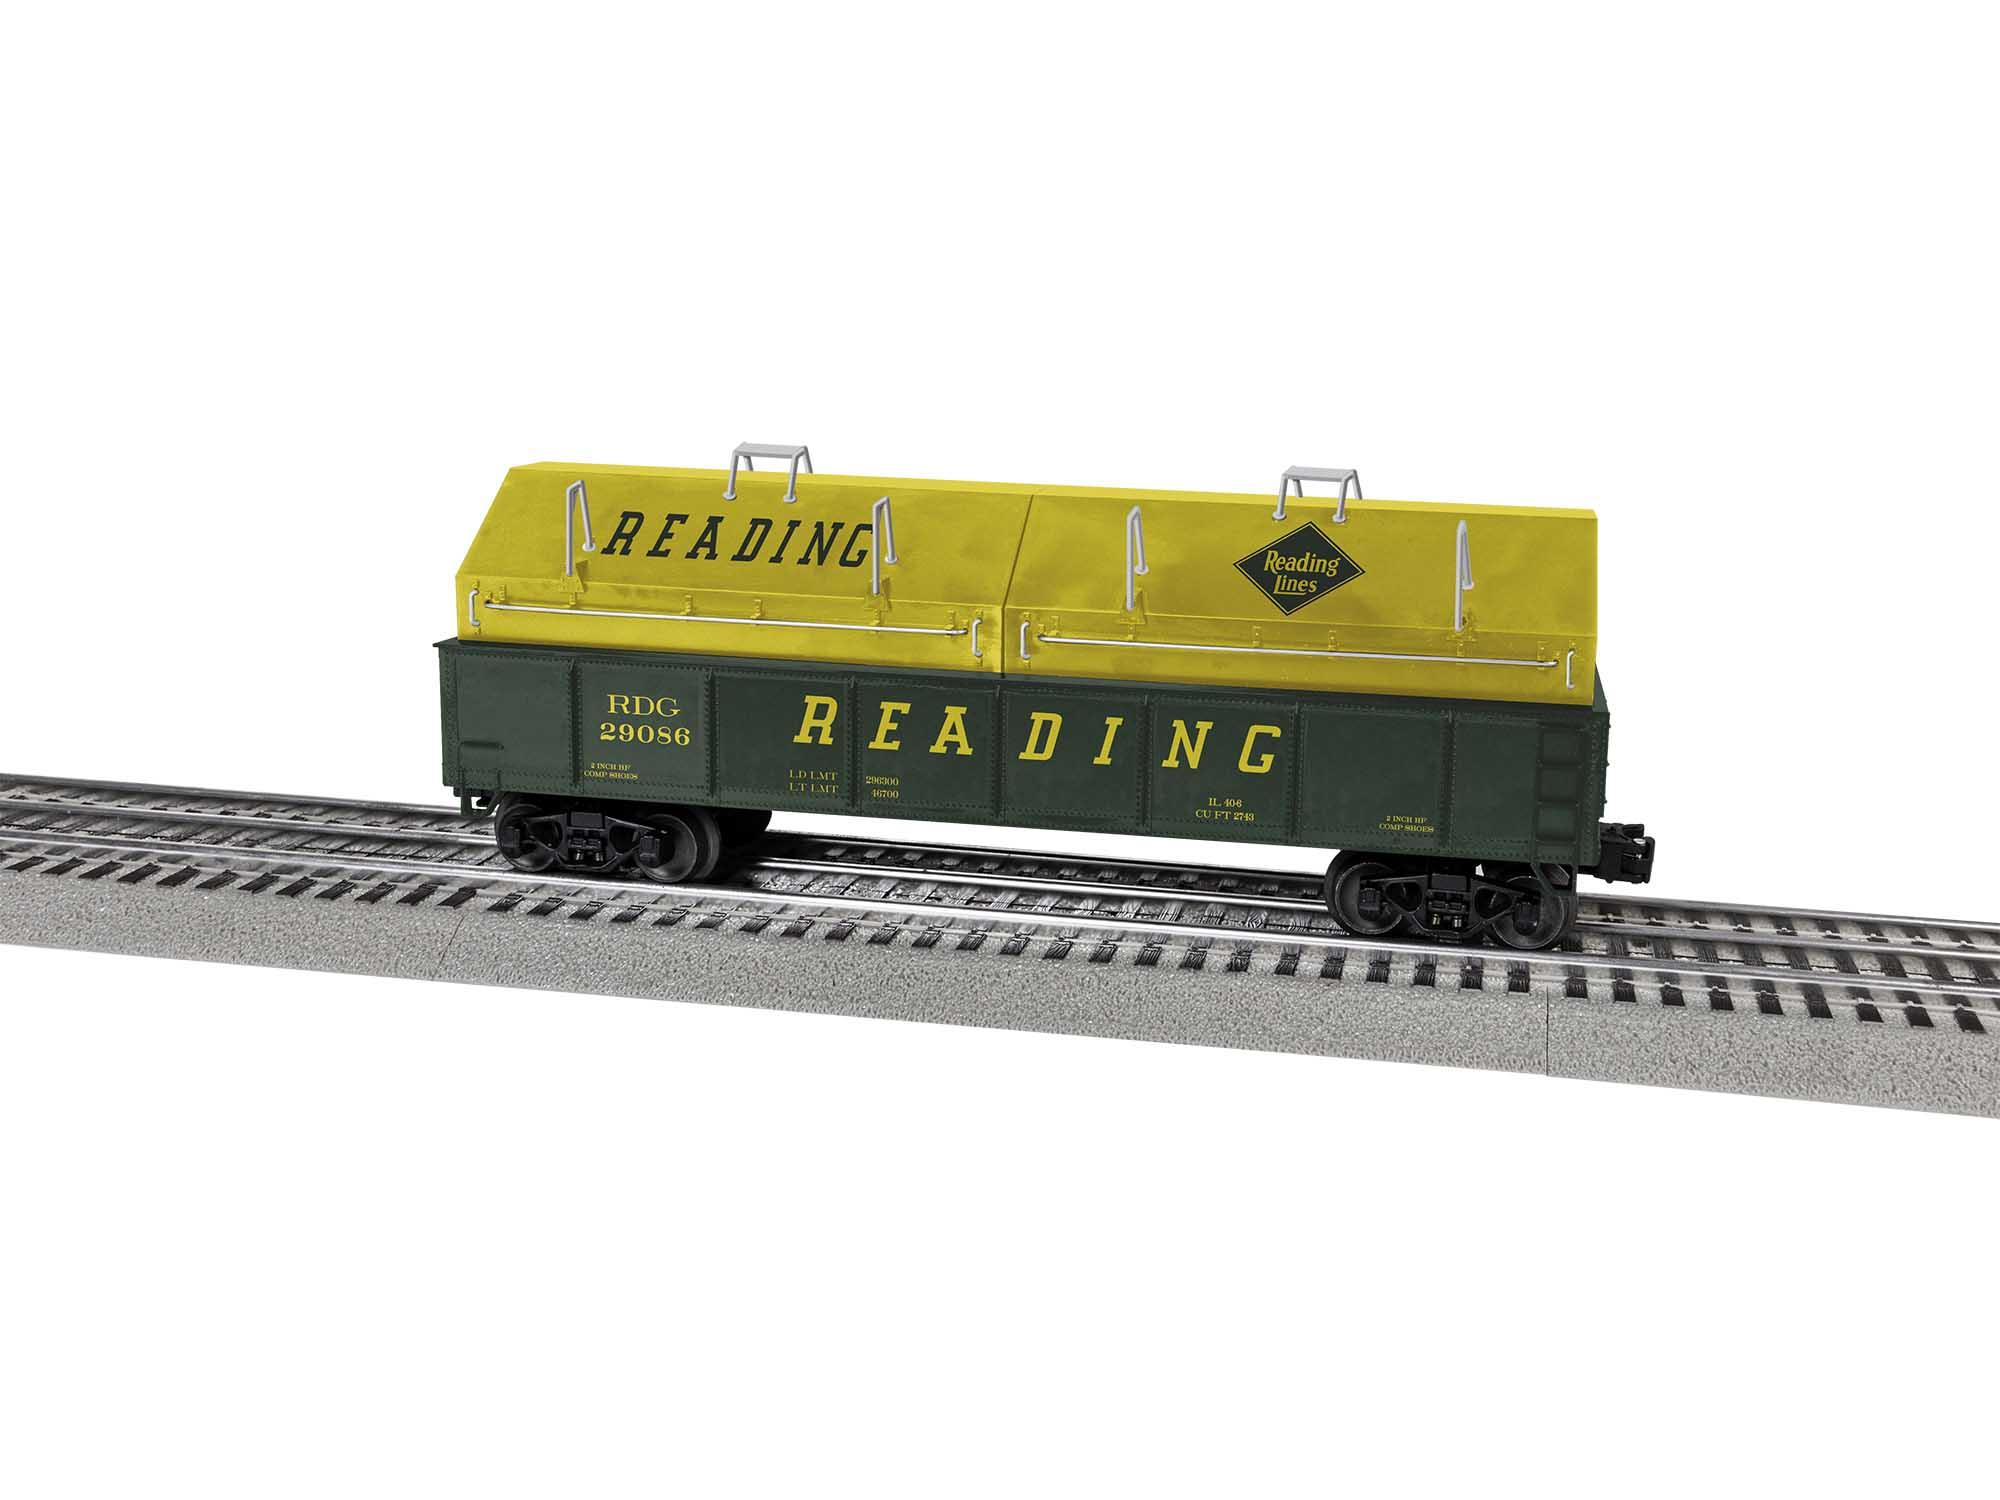 Lionel 2043162 O Gondola Reading RDG #29086